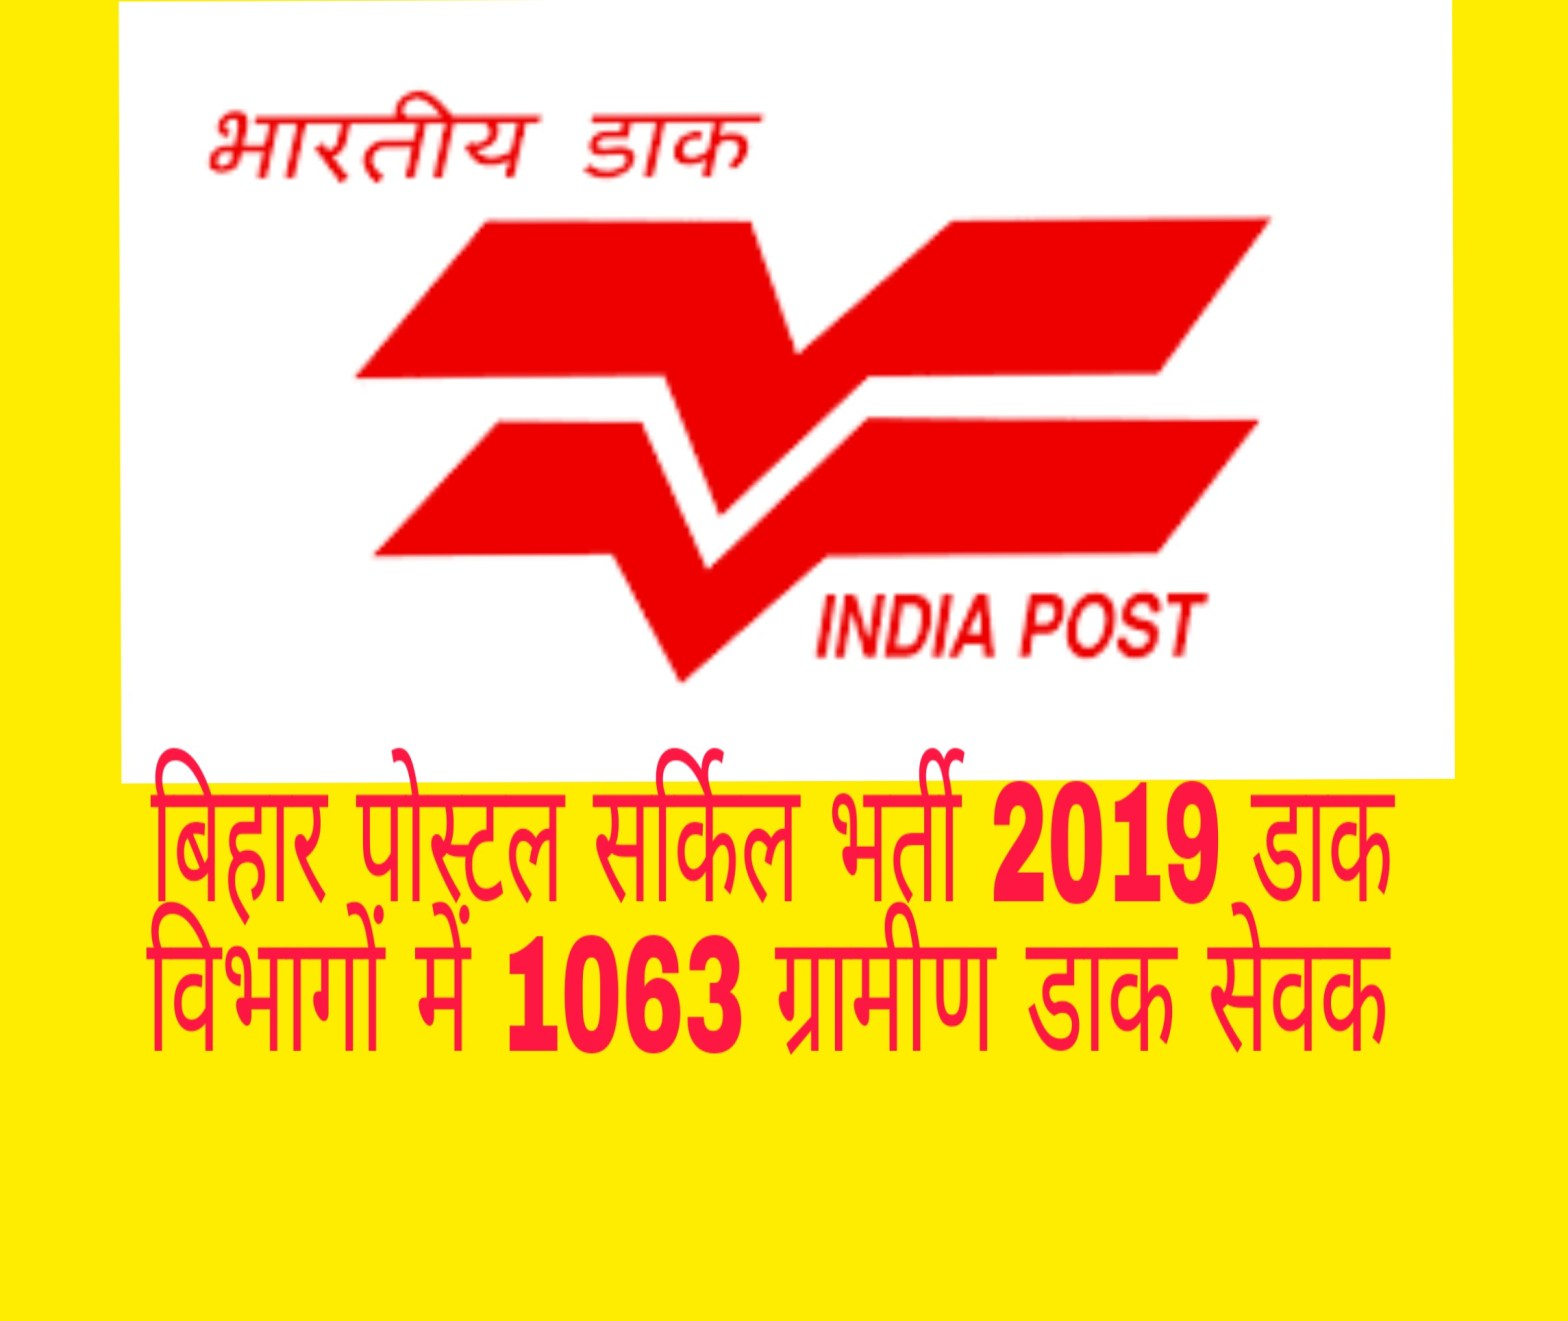 Bihar Postal Circle Recruitment 2019 : 10वीं पास के लिए